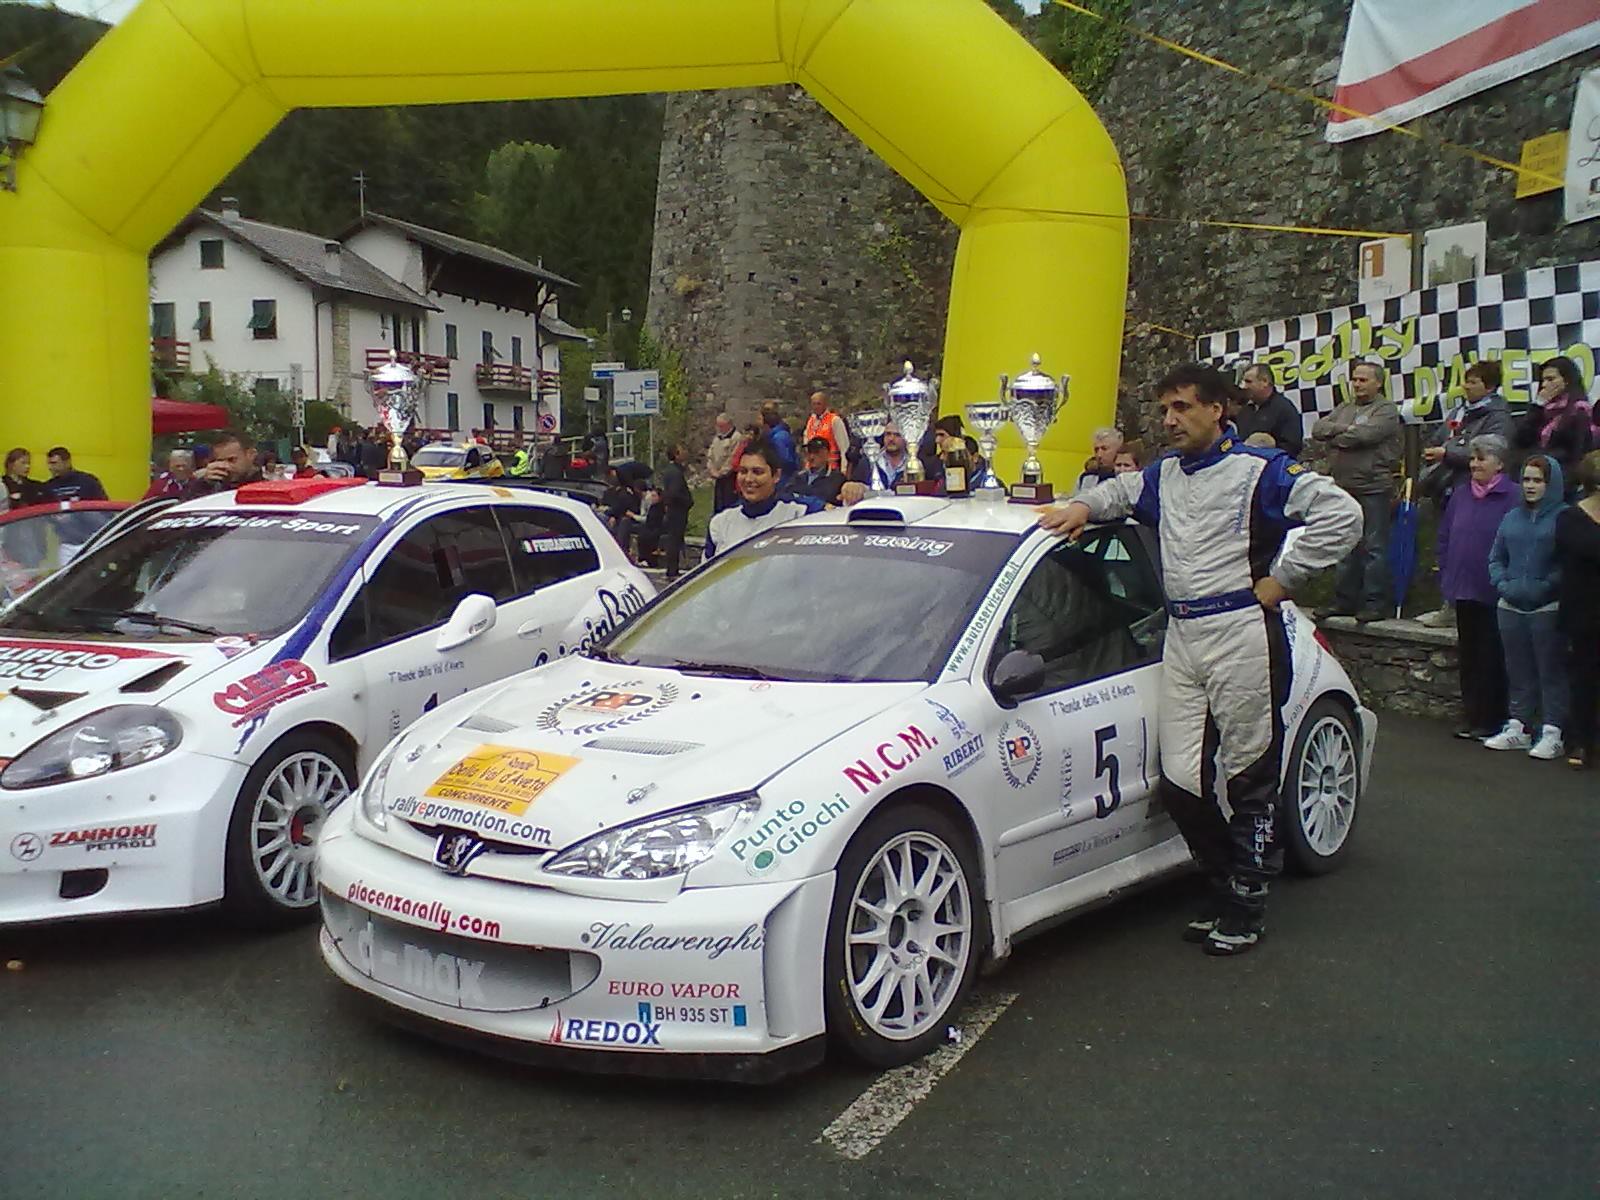 foto-rally-ronde-aveto-0035360142f7a69f.jpg